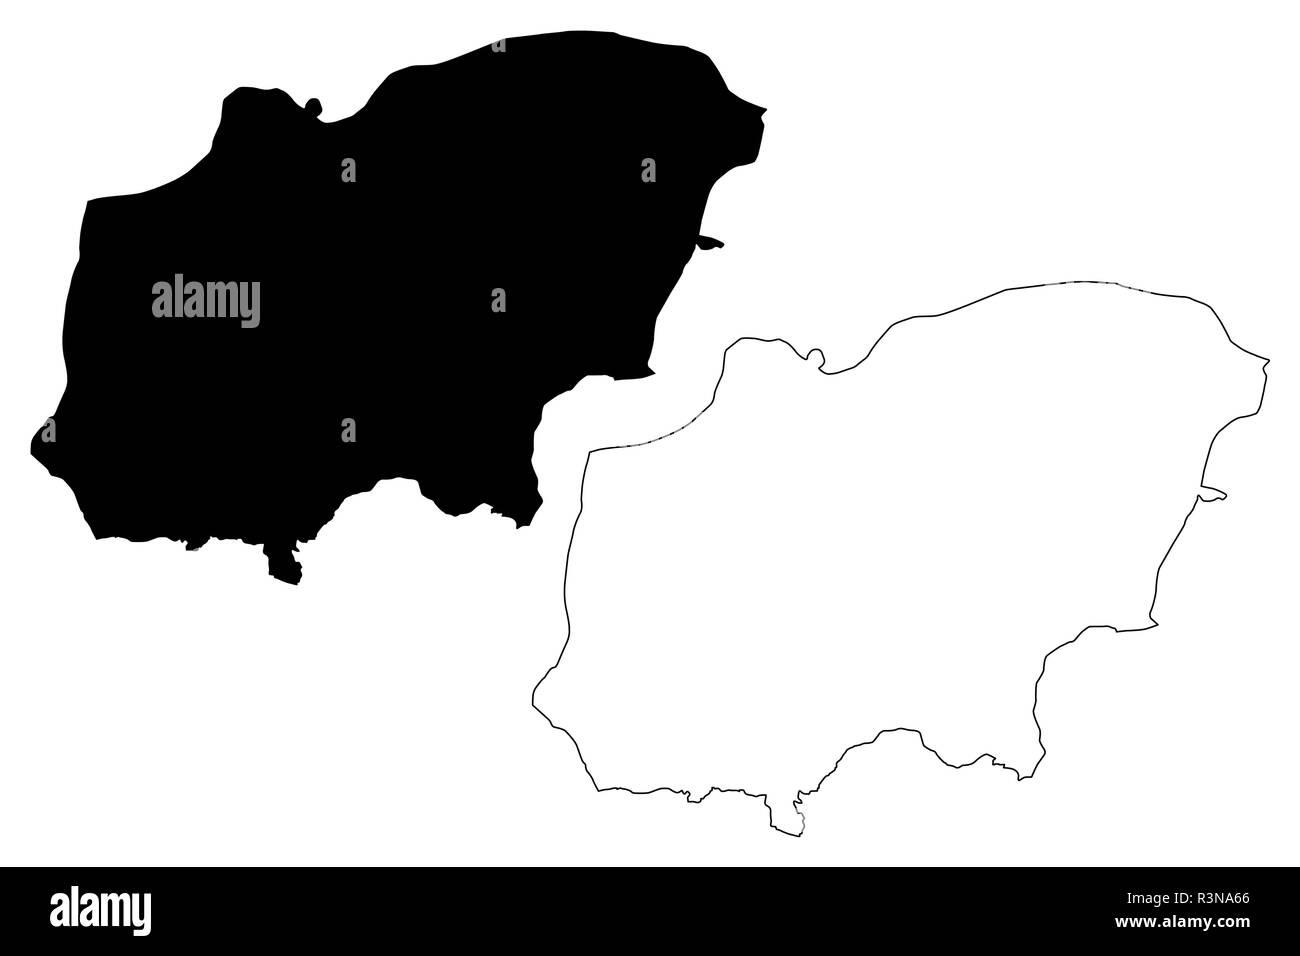 Usak (Provinces of the Republic of Turkey) map vector illustration, scribble sketch Uşak ili map - Stock Image